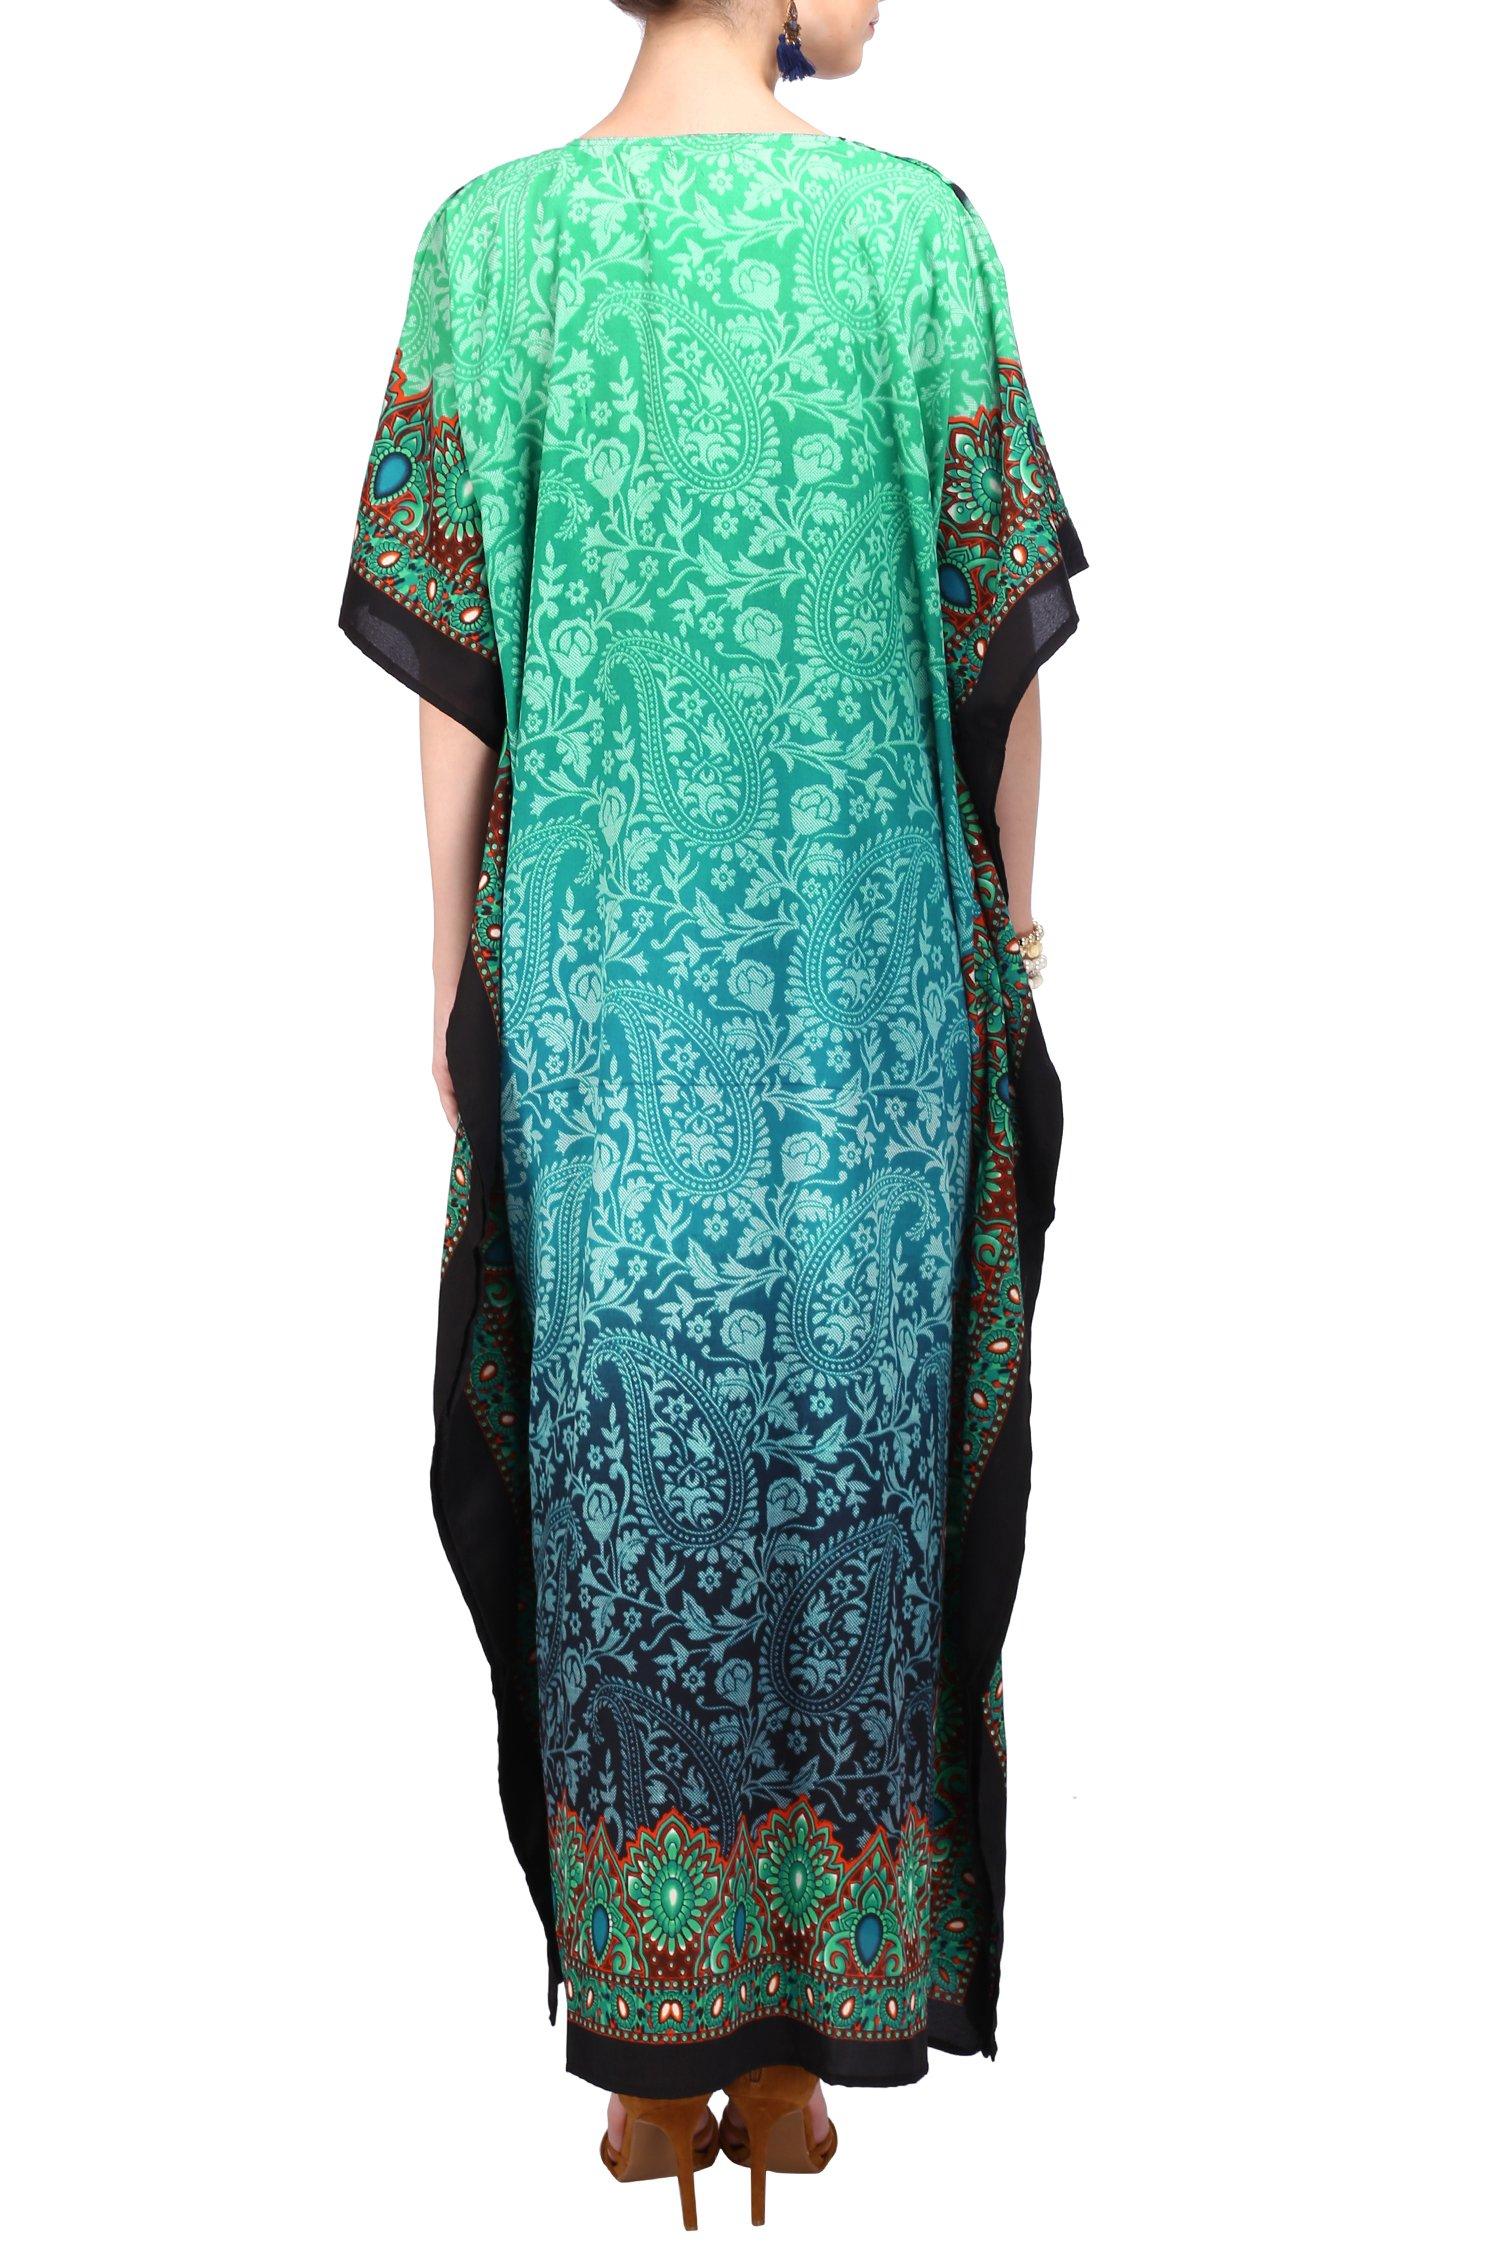 Miss Lavish London Women Kaftan Tunic Kimono Free Size Long Maxi Party Dress Loungewear Holidays Nightwear Beach Everyday Cover up Dresses by Miss Lavish London (Image #3)